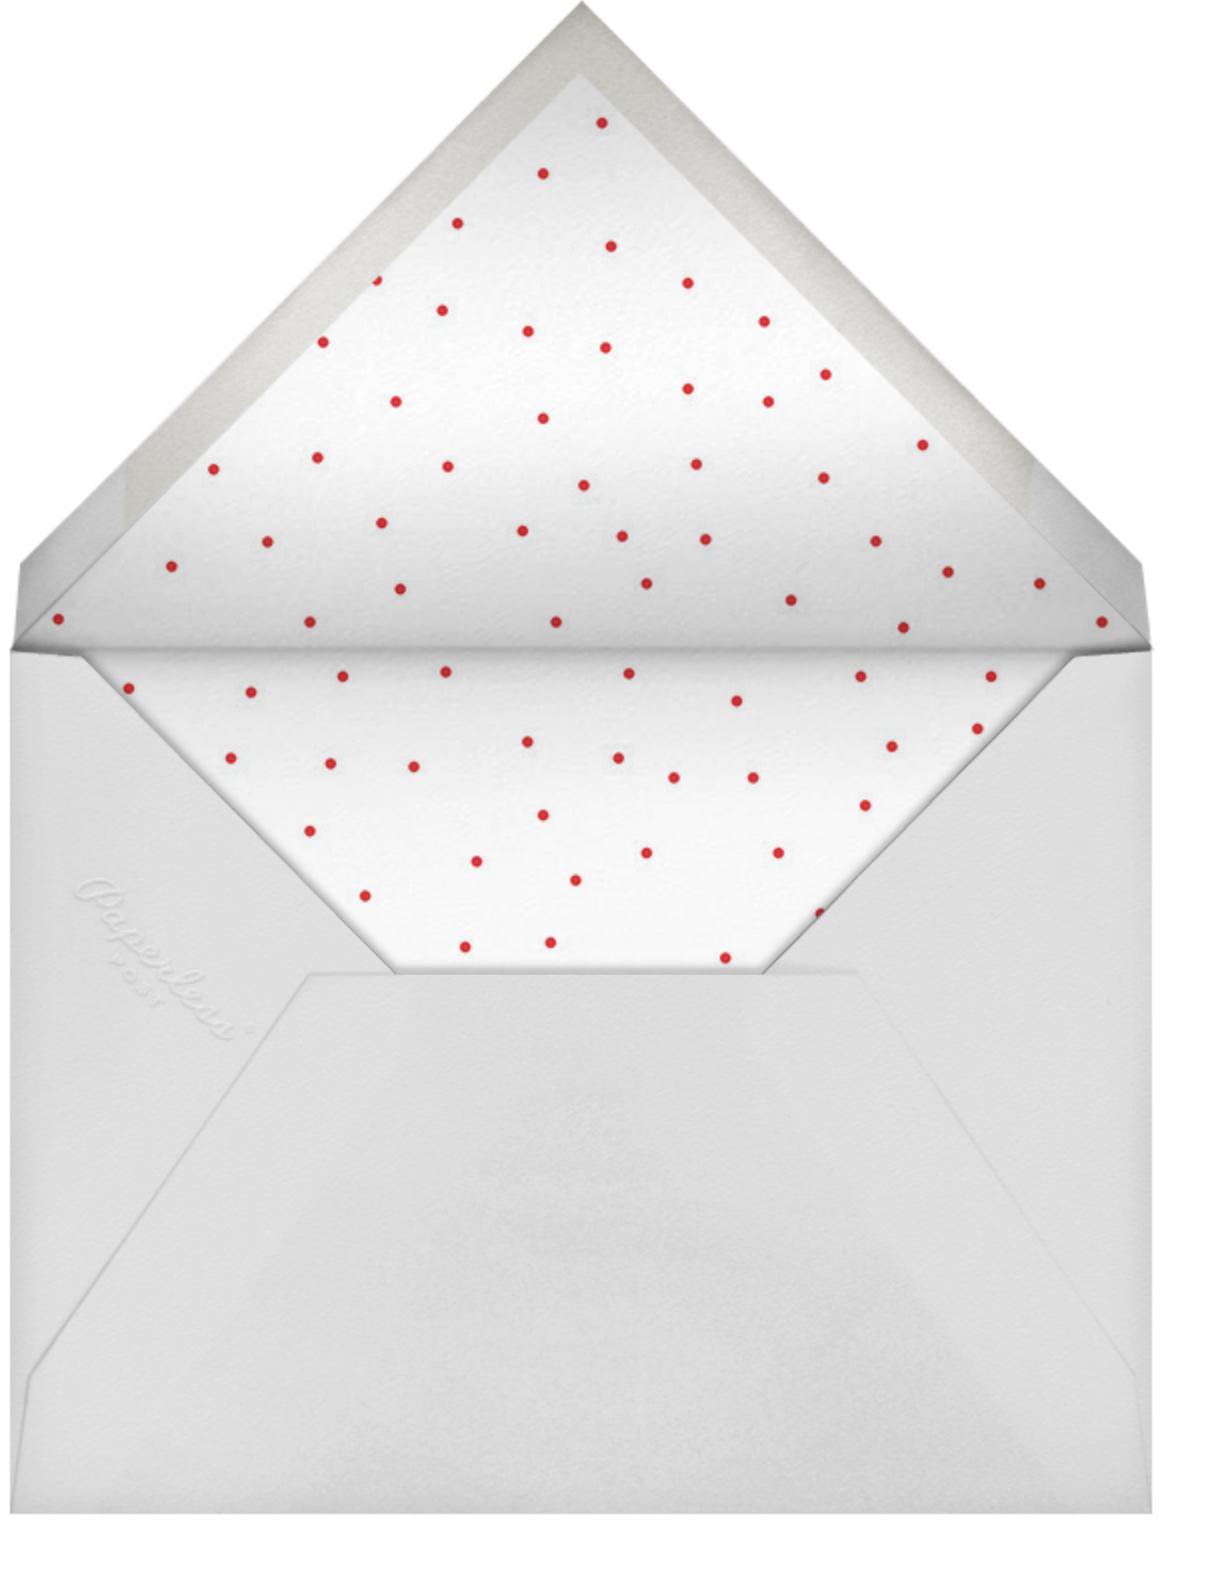 Denim Patch - White - Sugar Paper - Sports - envelope back